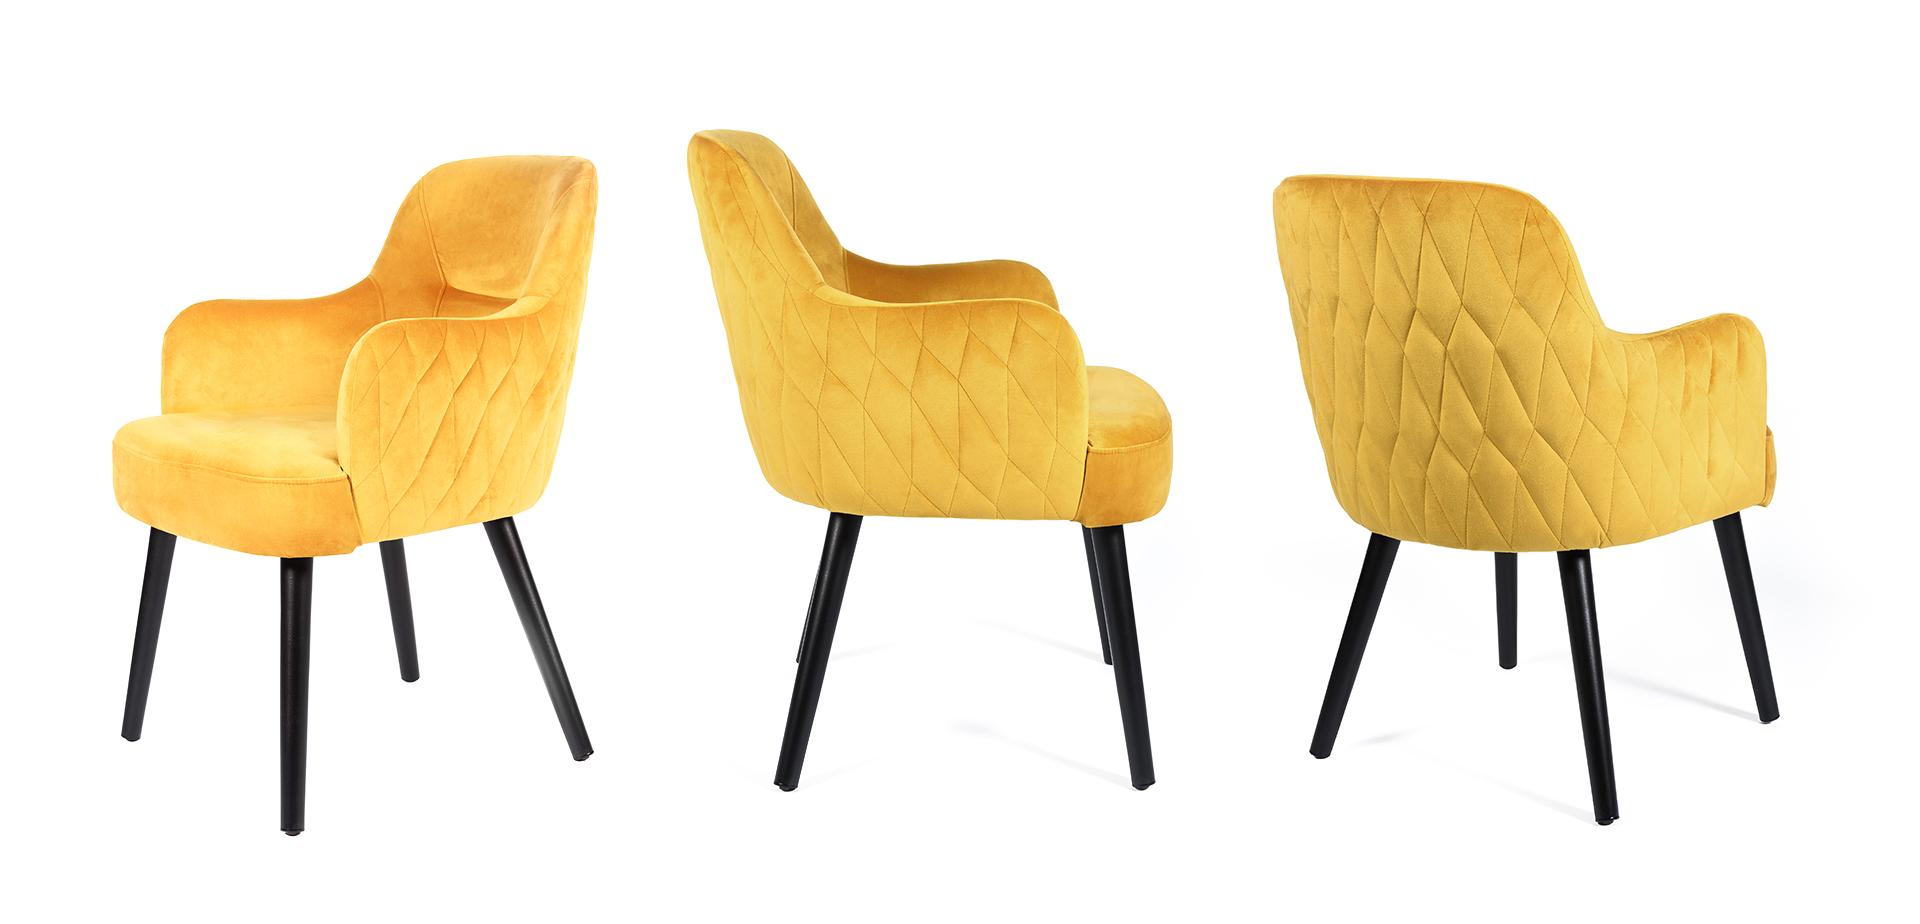 toledo-scaun-matlas-01.jpg